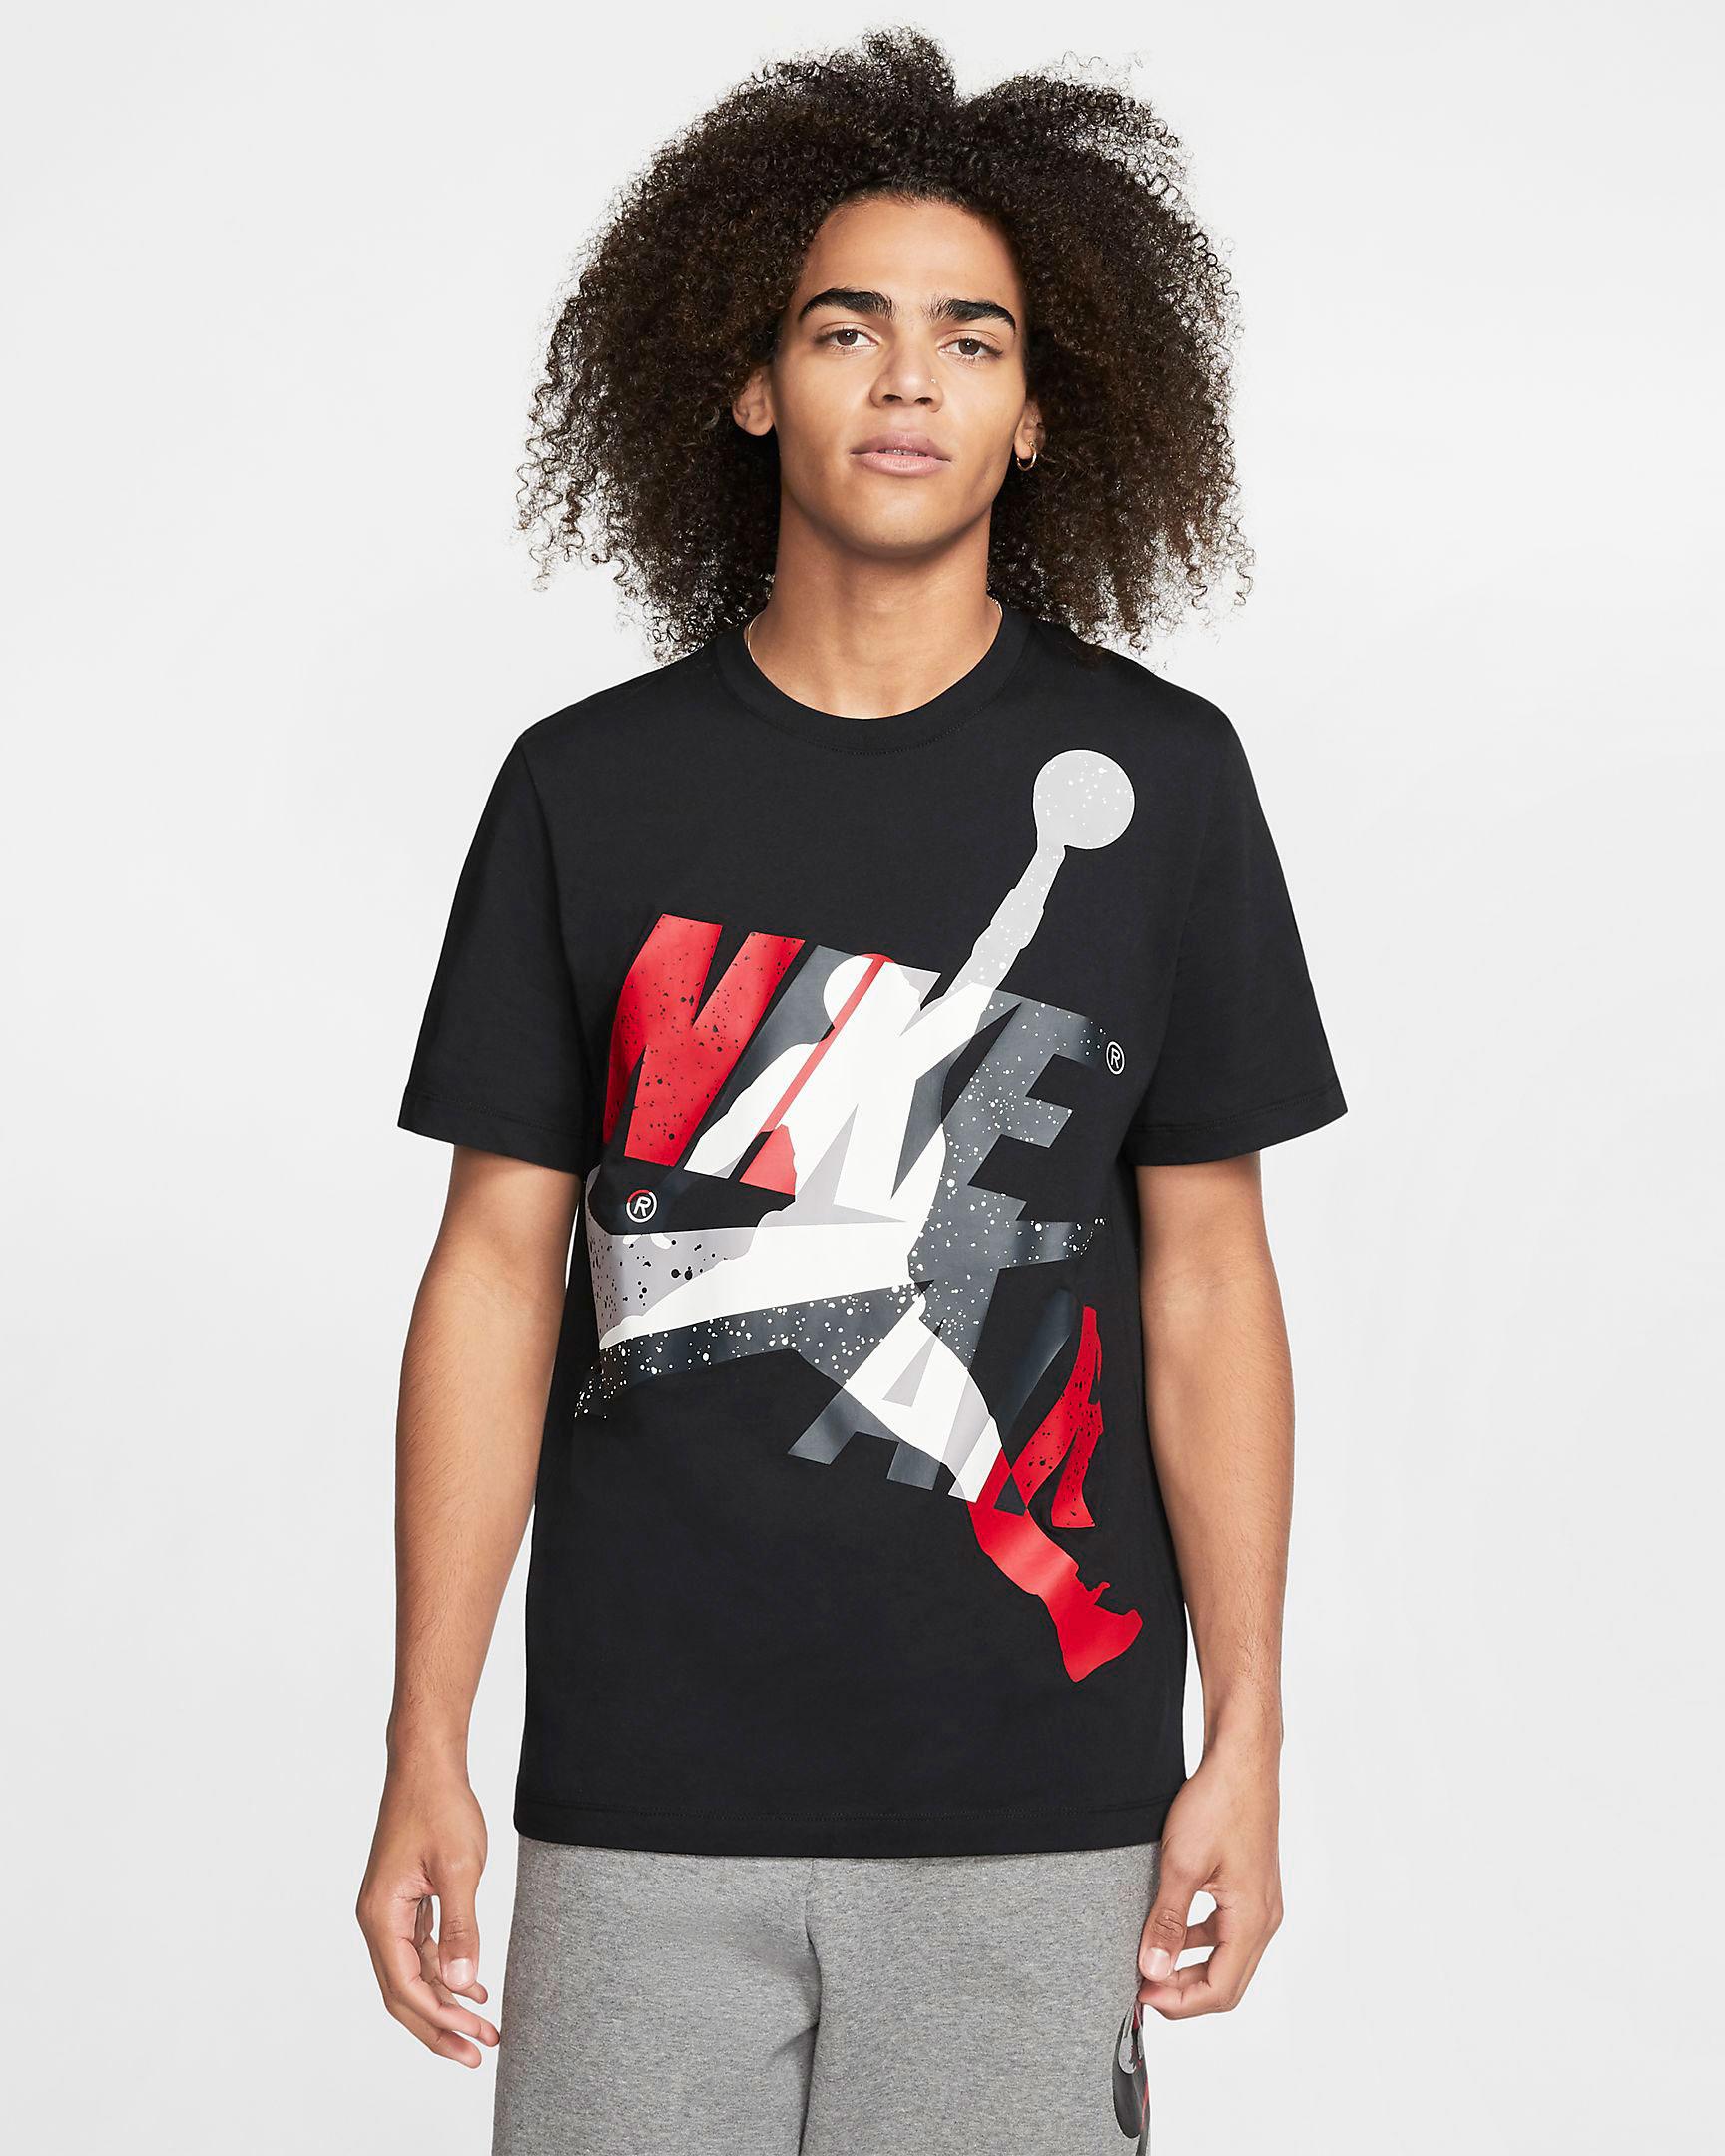 jordan-11-low-ie-black-cement-shirt-match-2